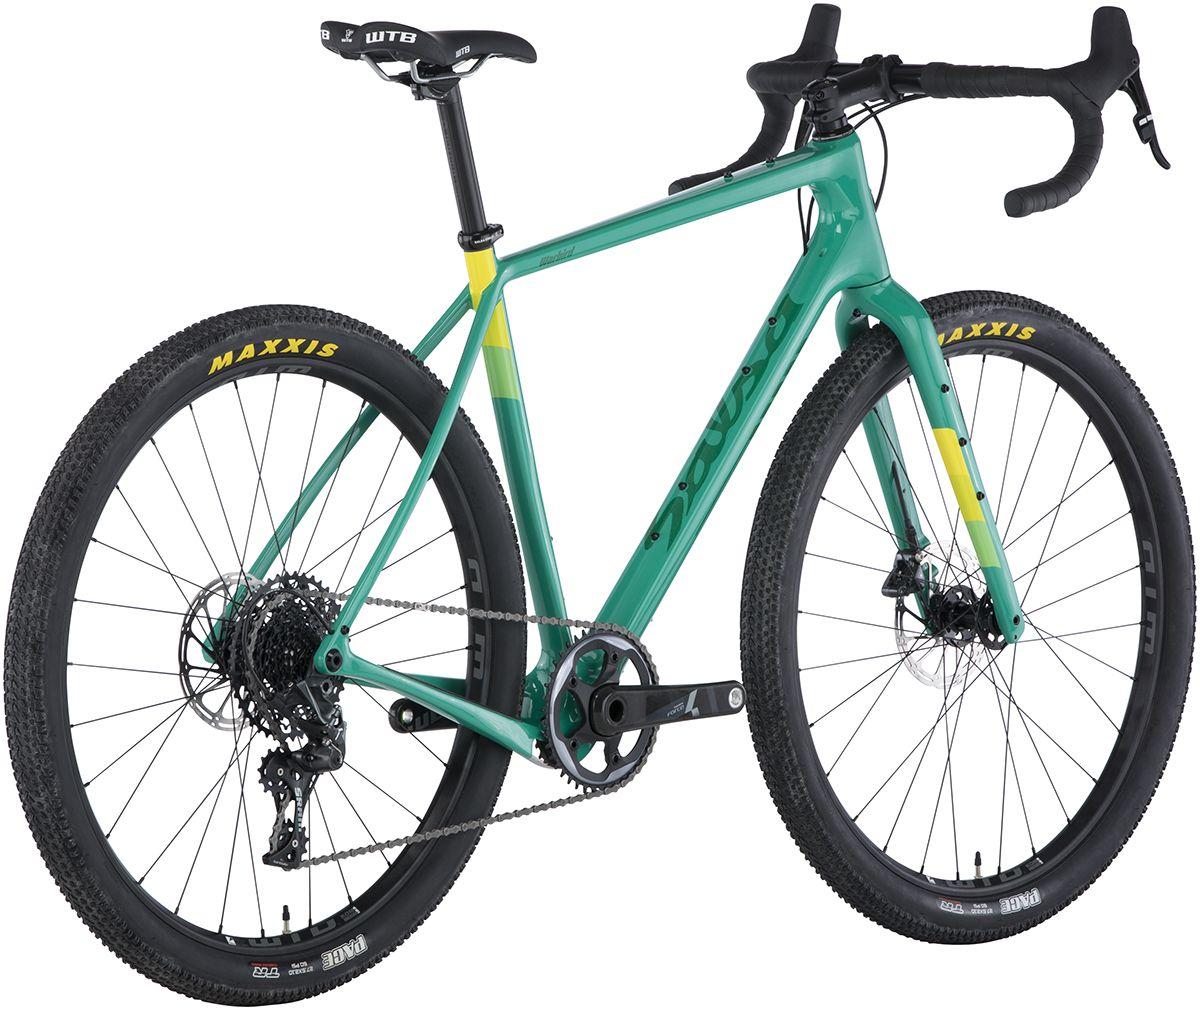 Salsa Warbird 2019 The Original Gravel Bike Gets Better Rund